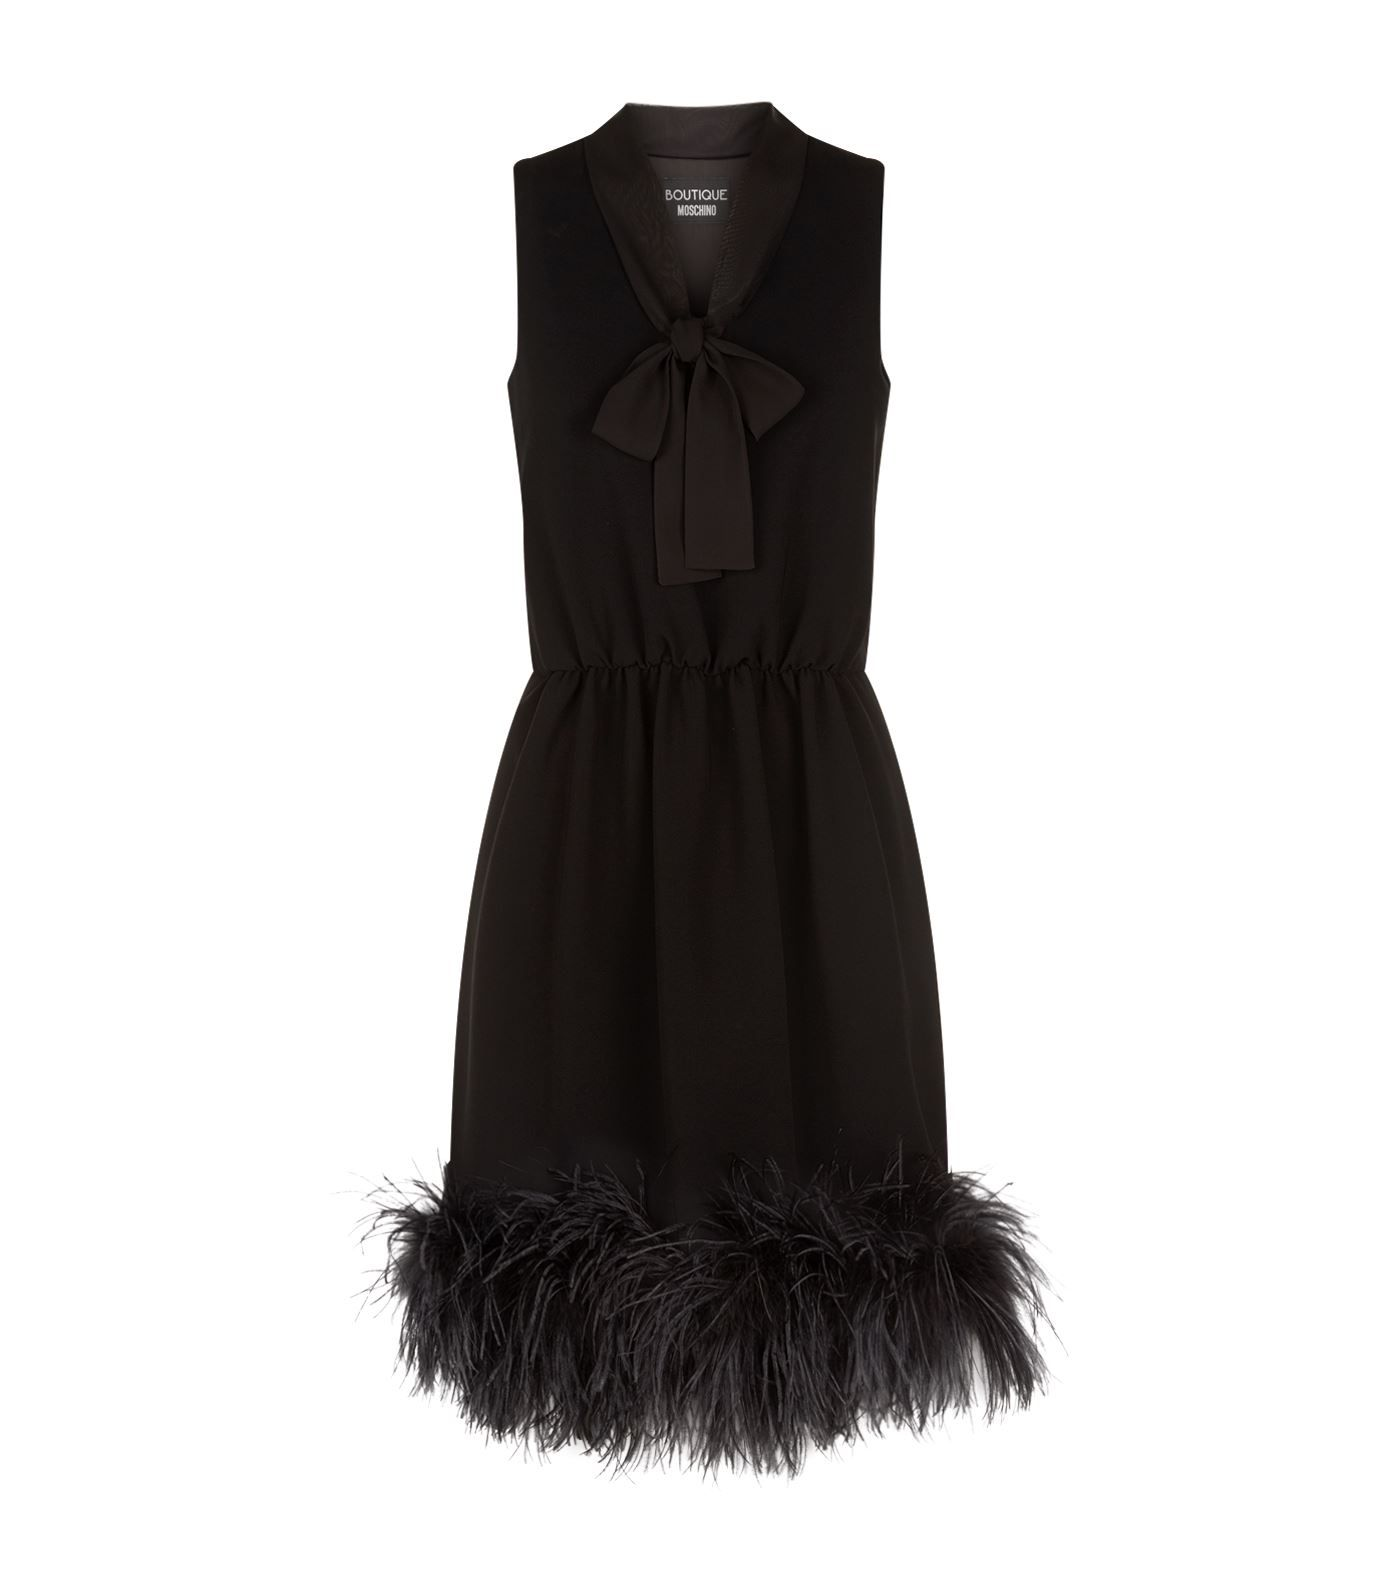 Boutique Moschino Ostrich Feather Trim Dress Harrods Com Dresses Necklines For Dresses Elegant Dresses [ 1592 x 1400 Pixel ]